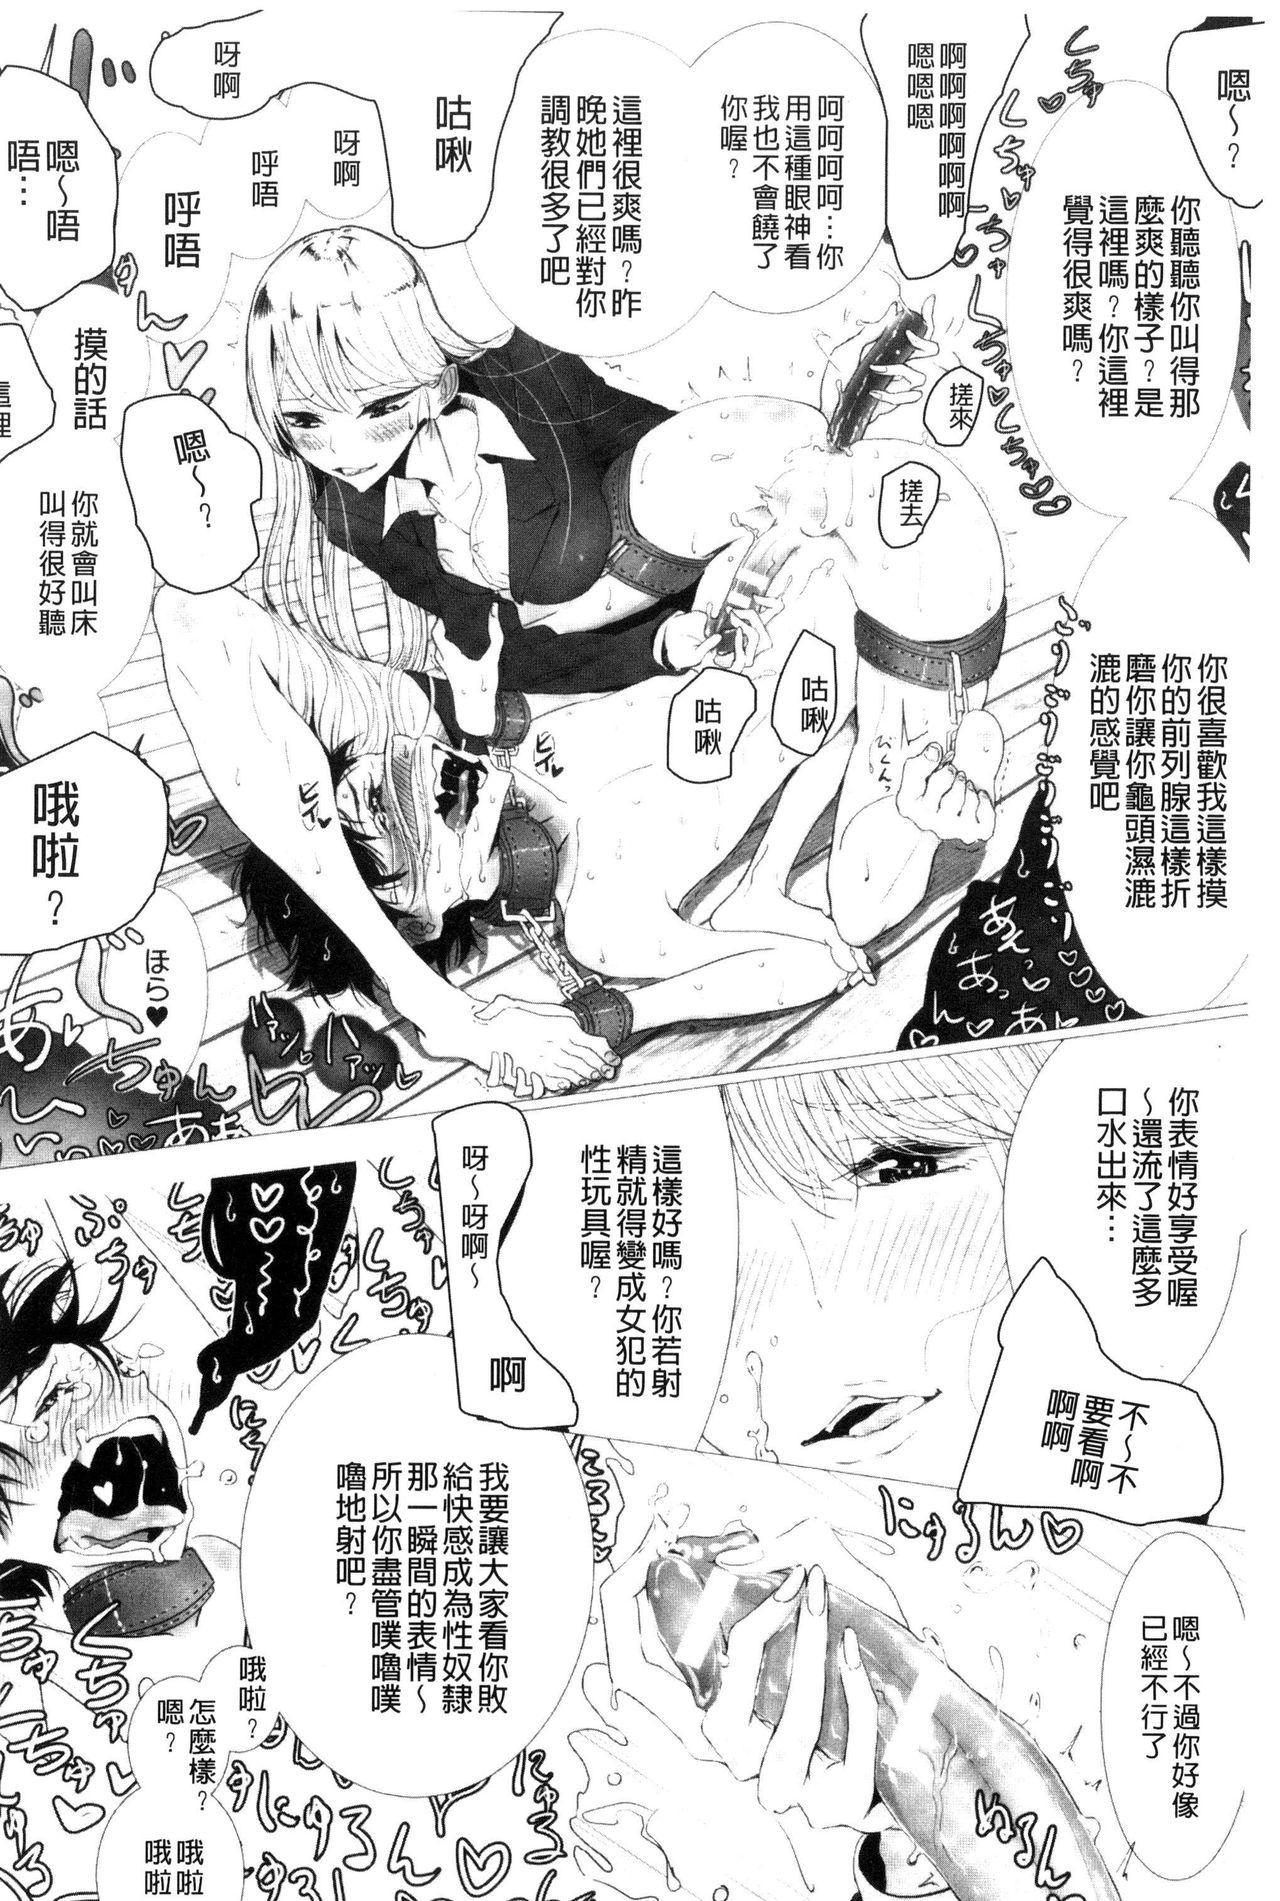 [Dhibi] Sono Yubisaki de Korogashite - Please Caress it at the Finger-tip. [Chinese] 175